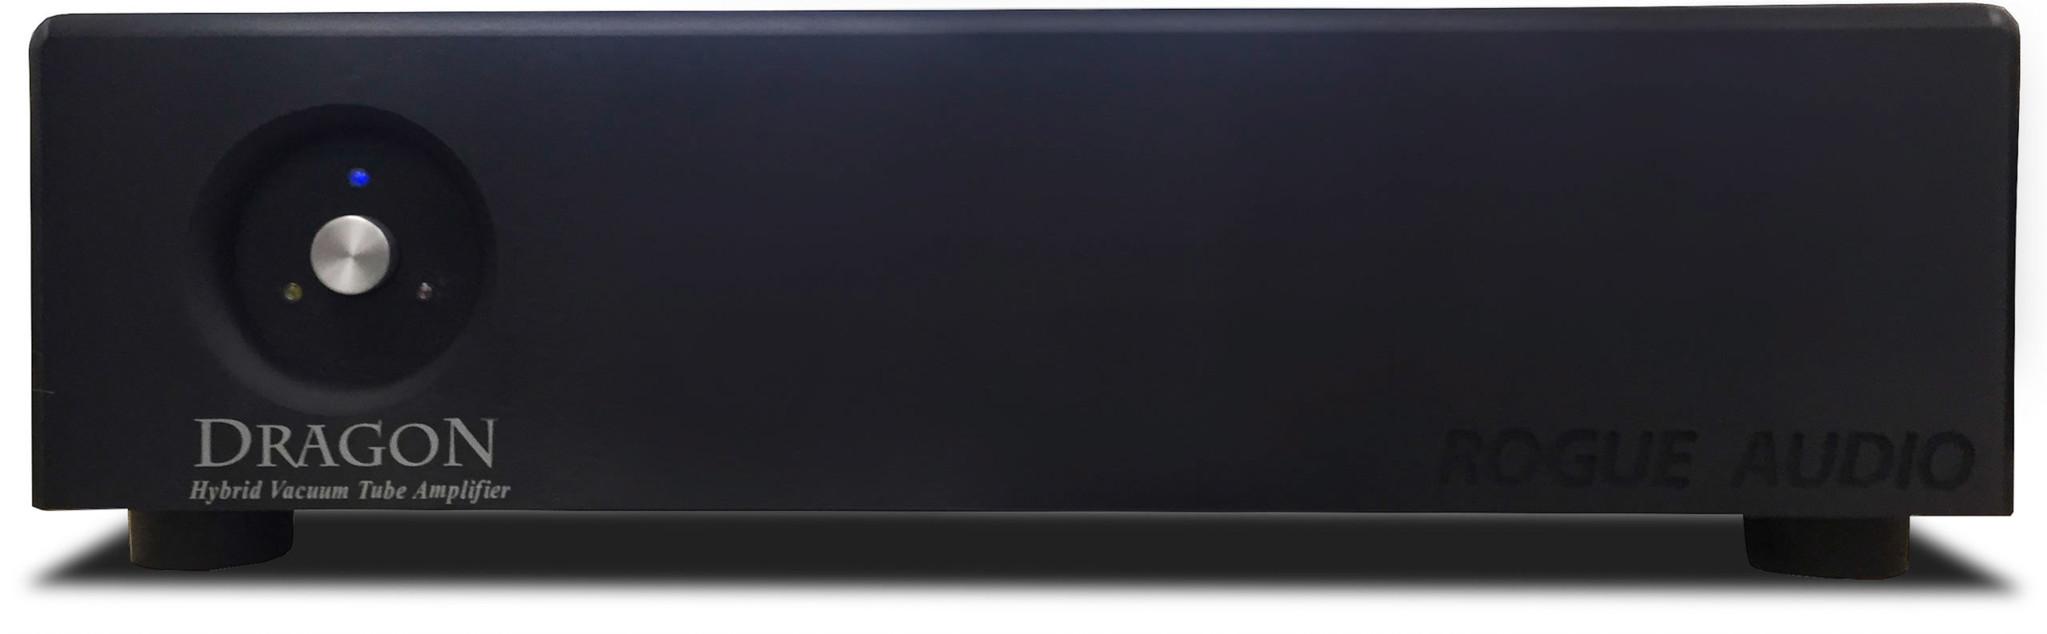 Rogue Audio Dragon Power Amplifier